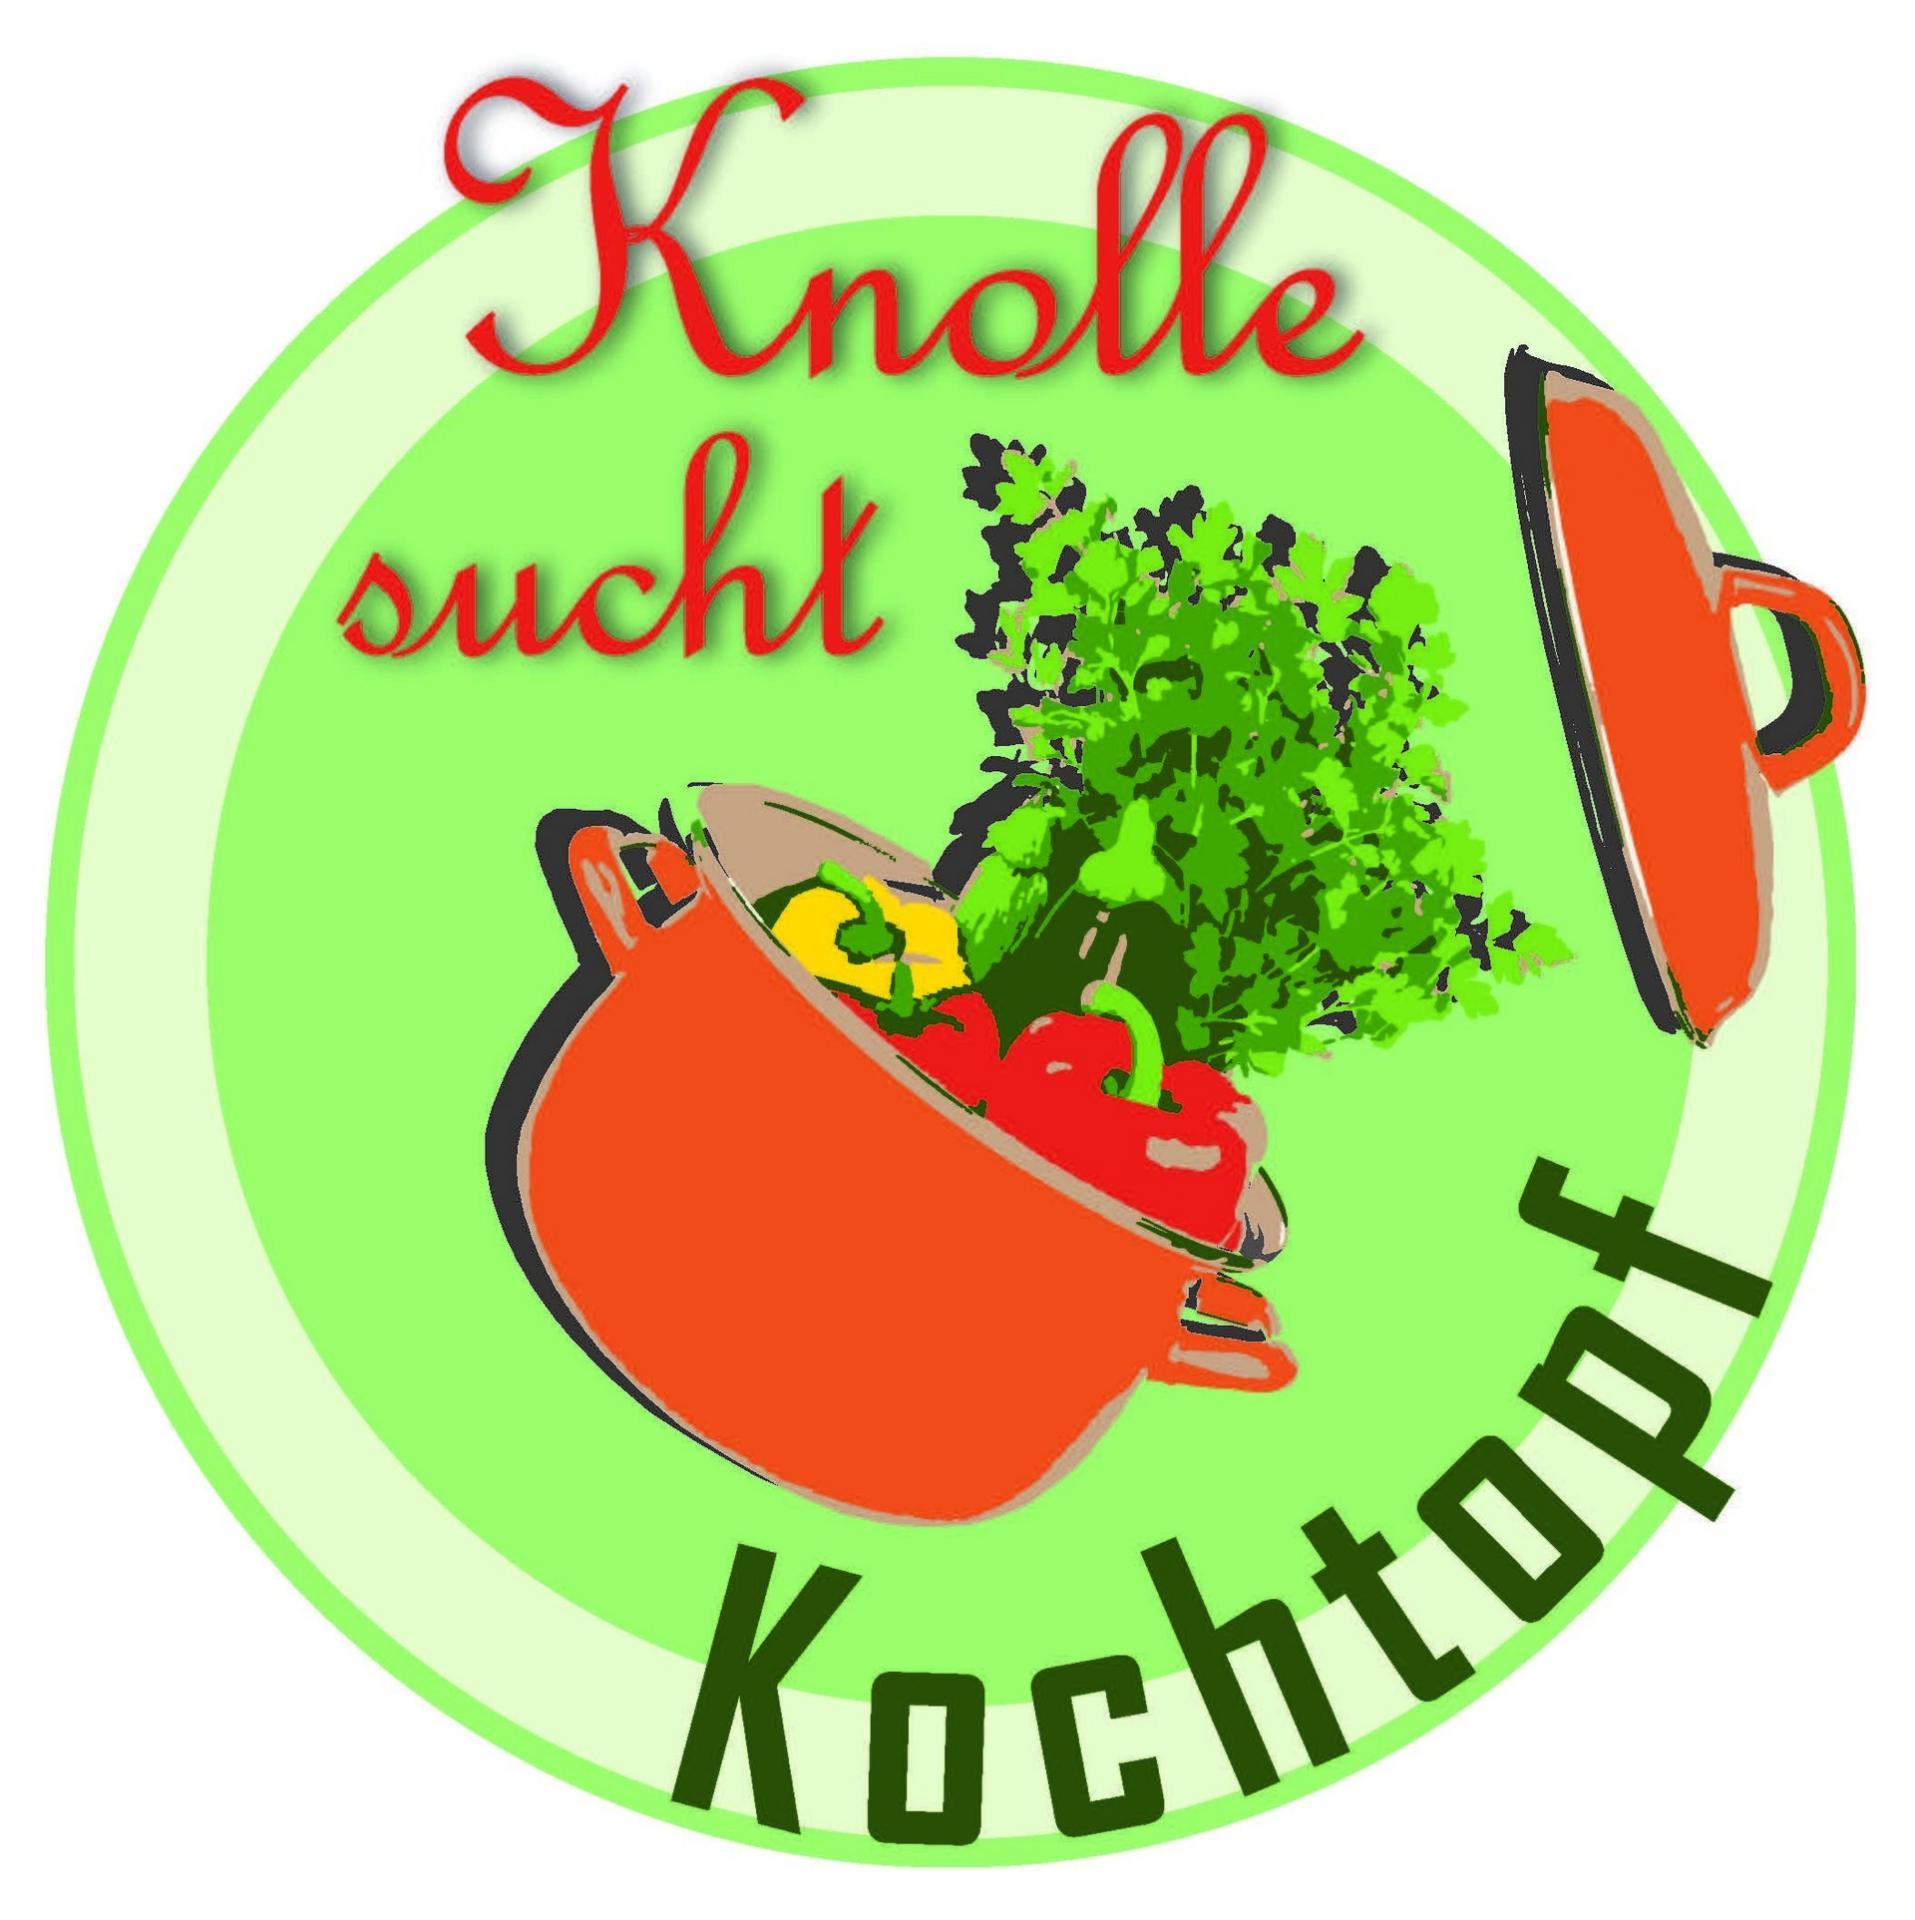 Logo_Knolle_sucht_Kochtopf